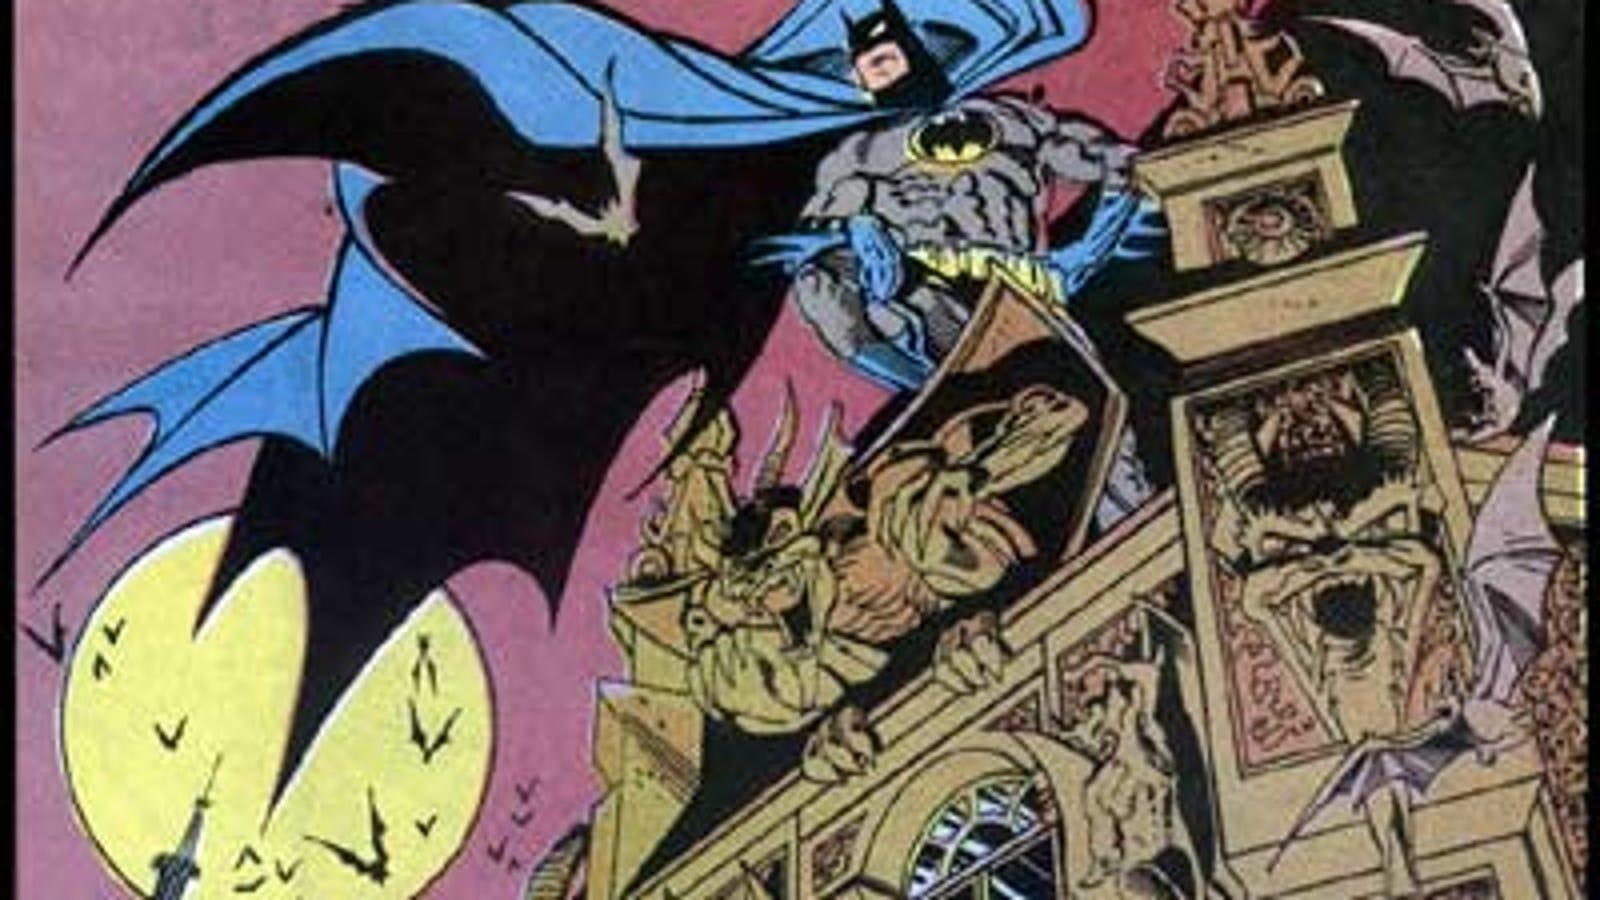 Batman Artist Norm Breyfogle Needs Your Help